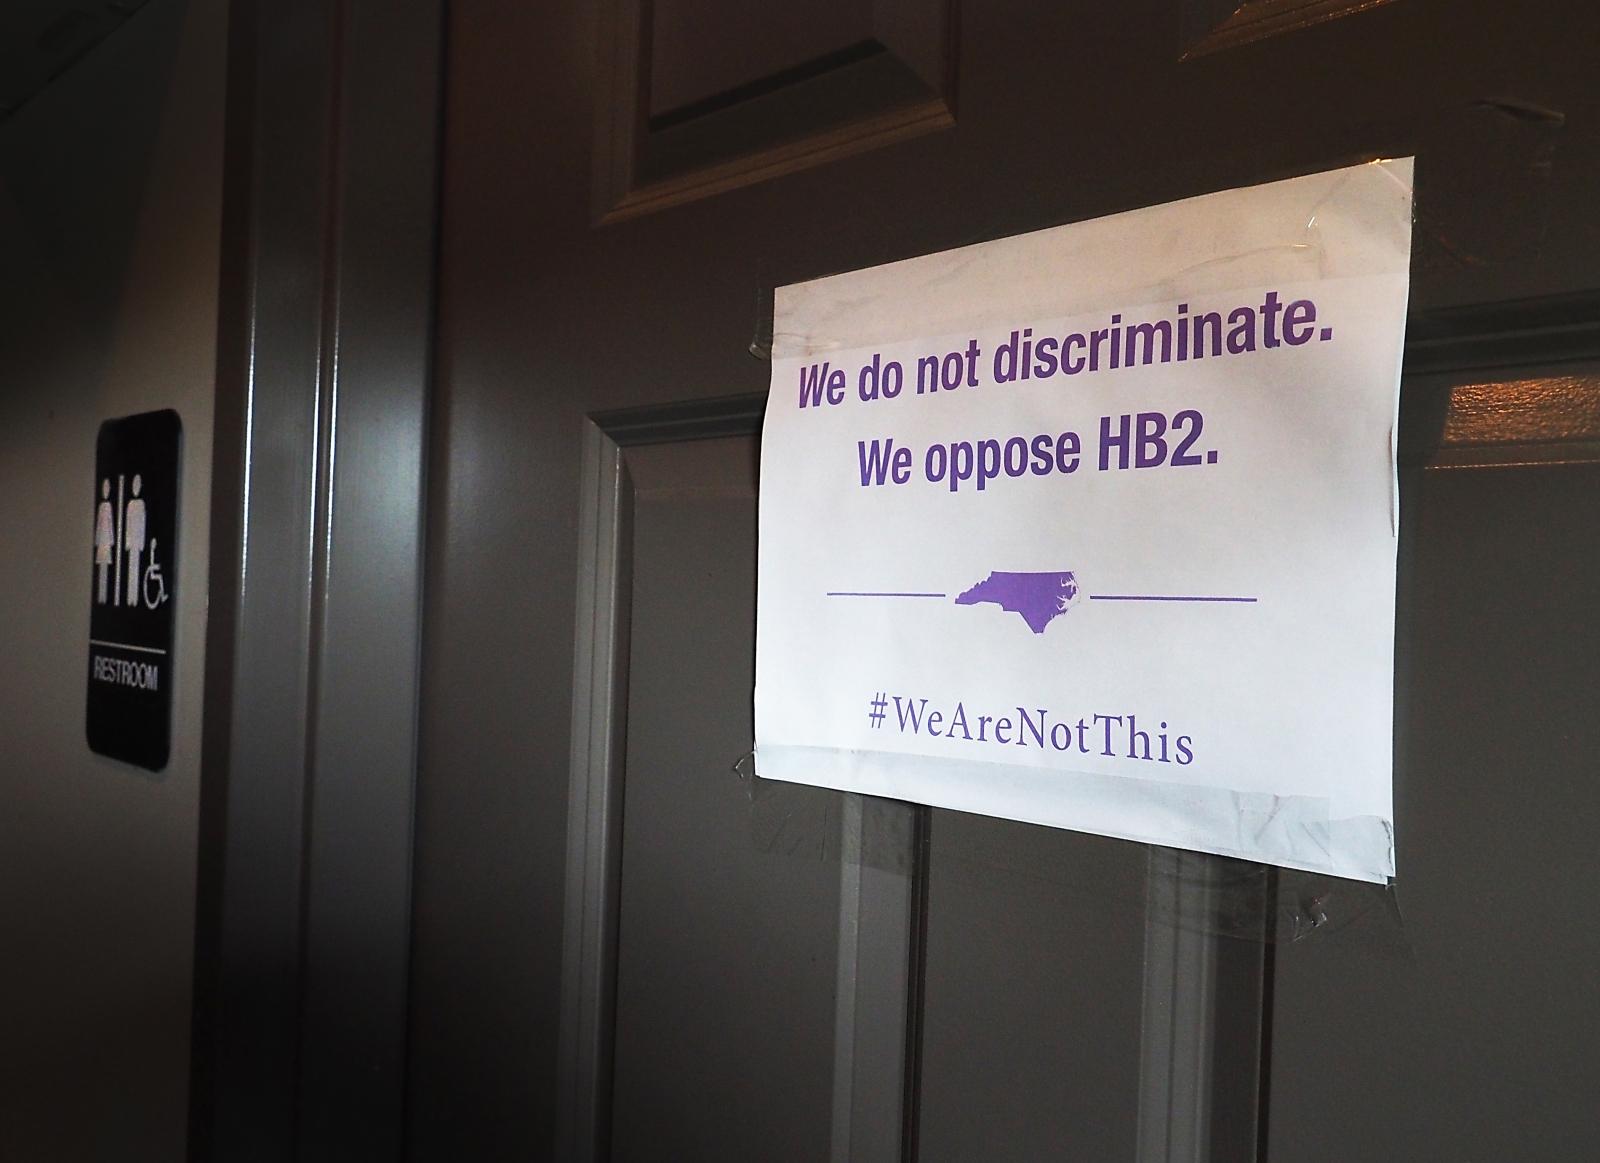 North Carolina 39 S Anti Transgender 39 Bathroom Bill 39 Is Losing The State Billions